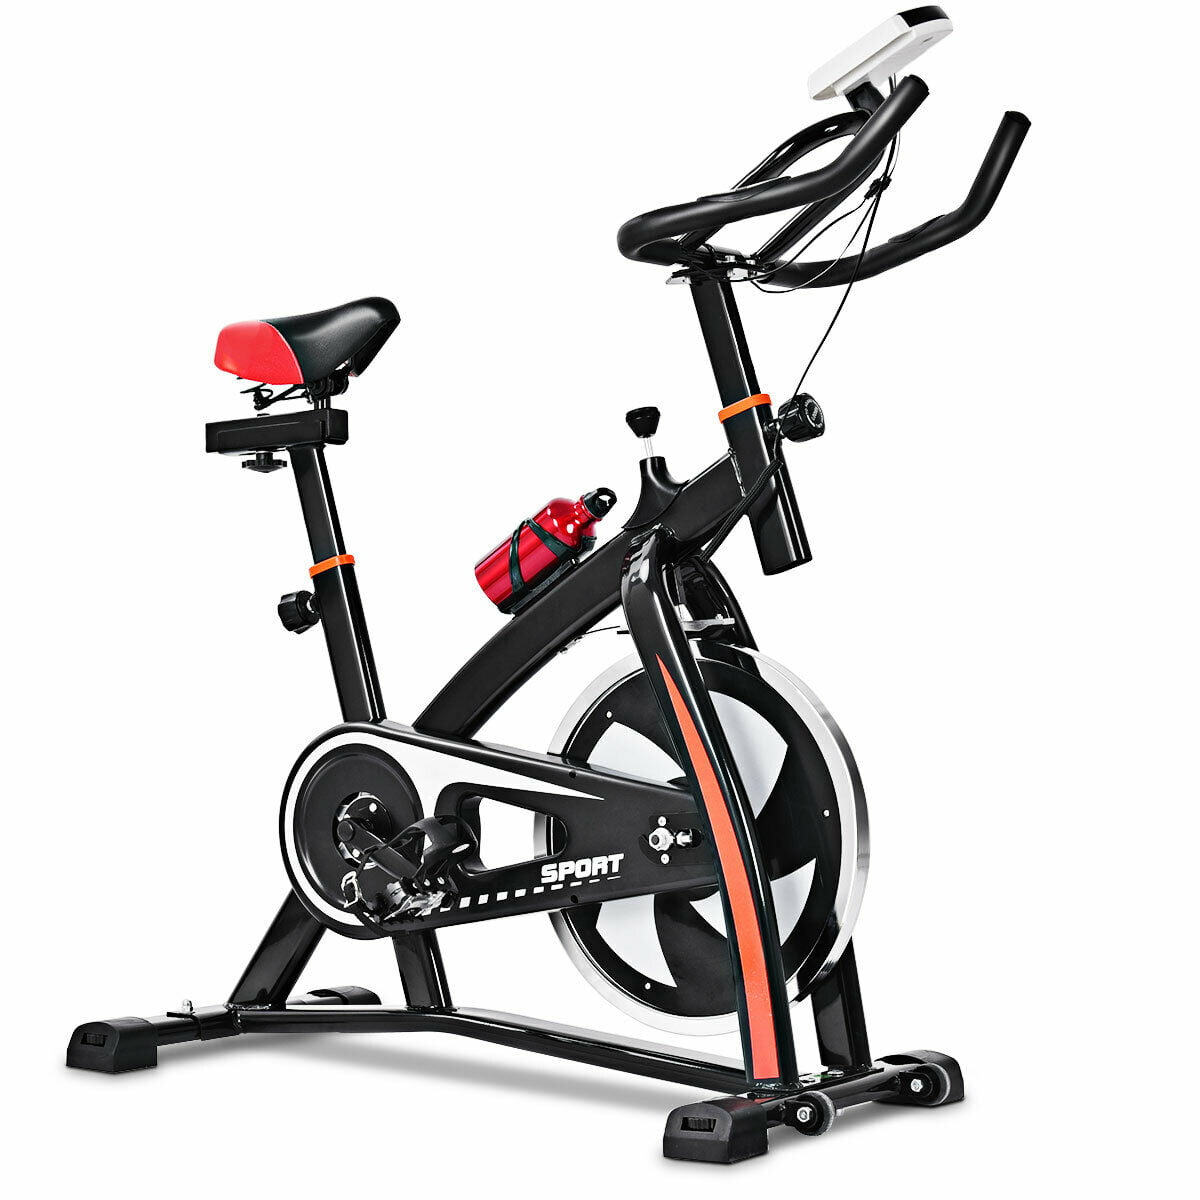 Costway Exercise Cycling Cardio Adjustable Gym Workout Bike